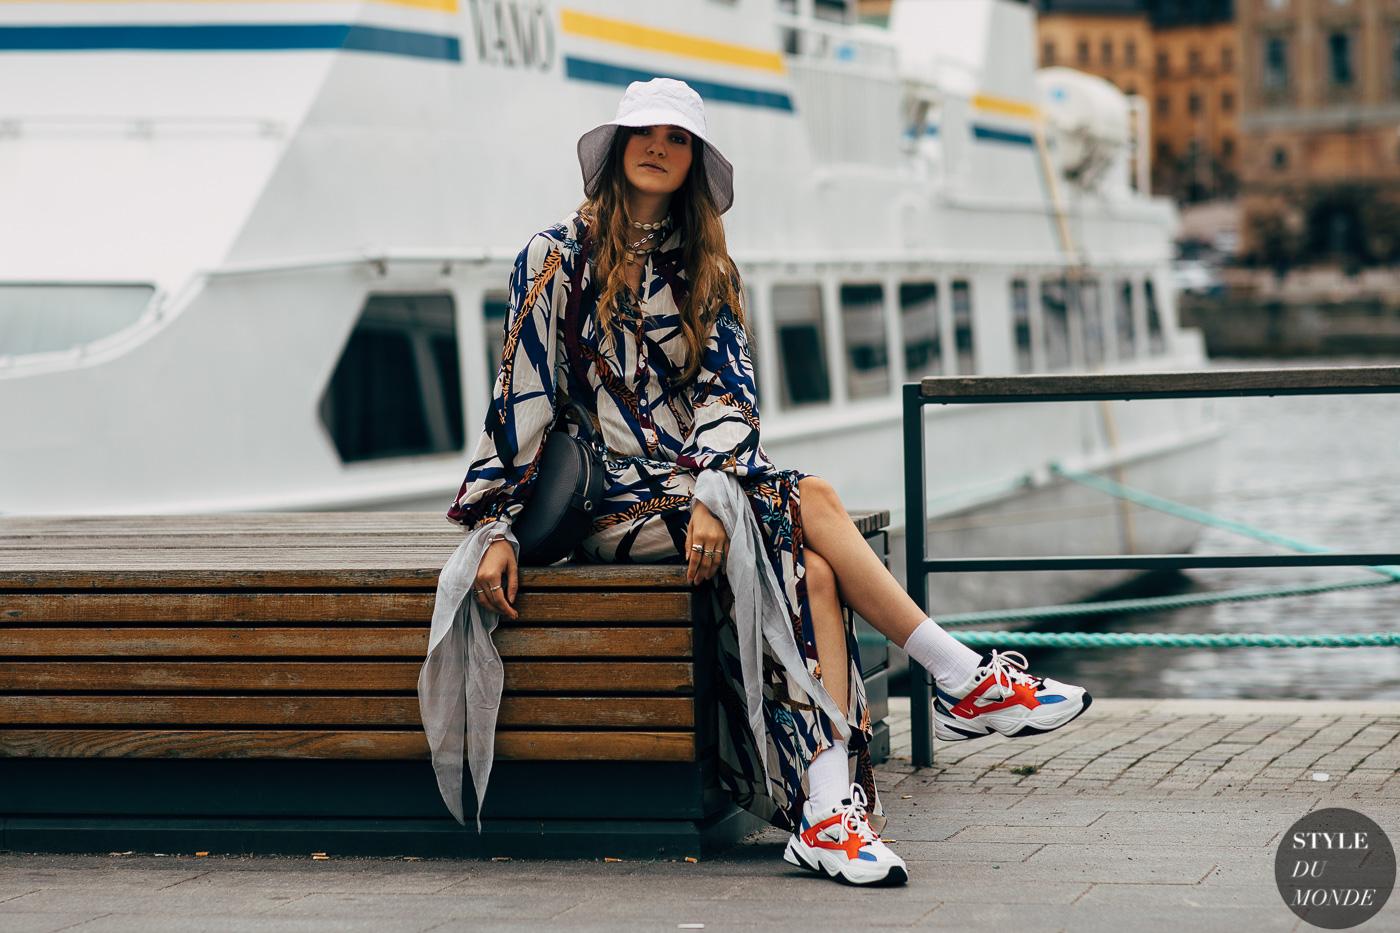 Stockholm FW SS 2019 Street Style